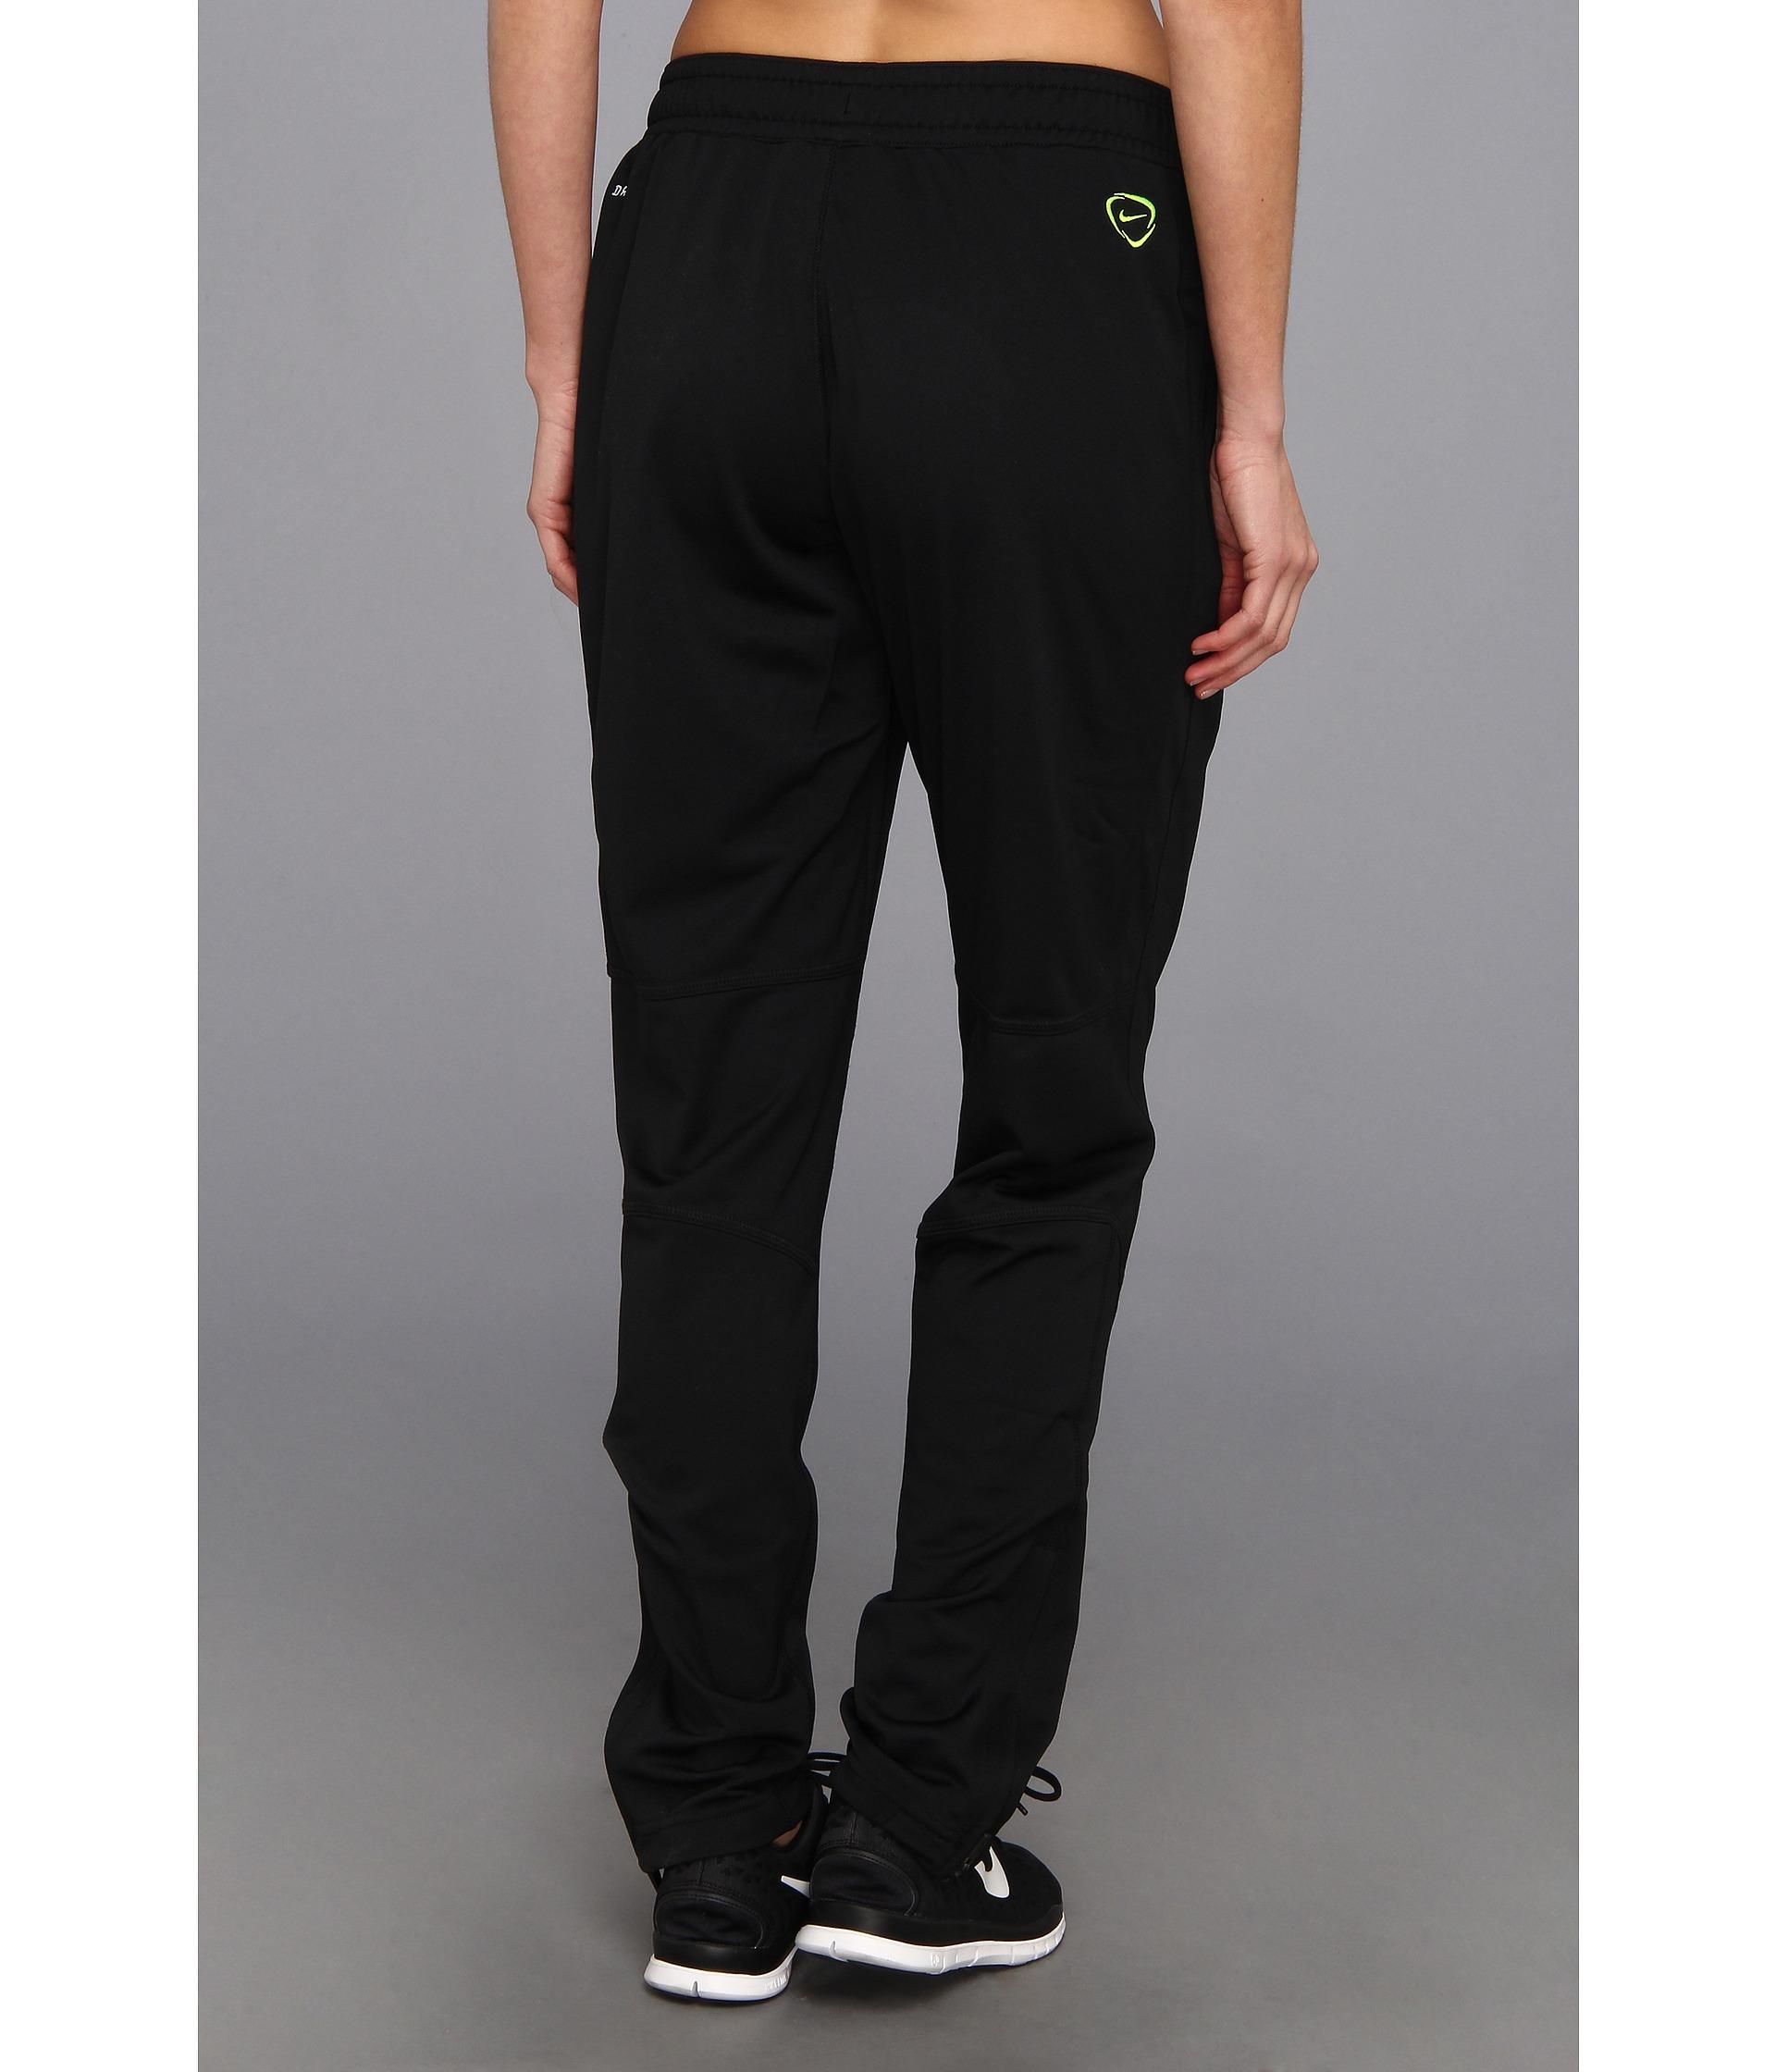 Nike Soccer Knit Pant, Clothing | Shipped Free at Zappos